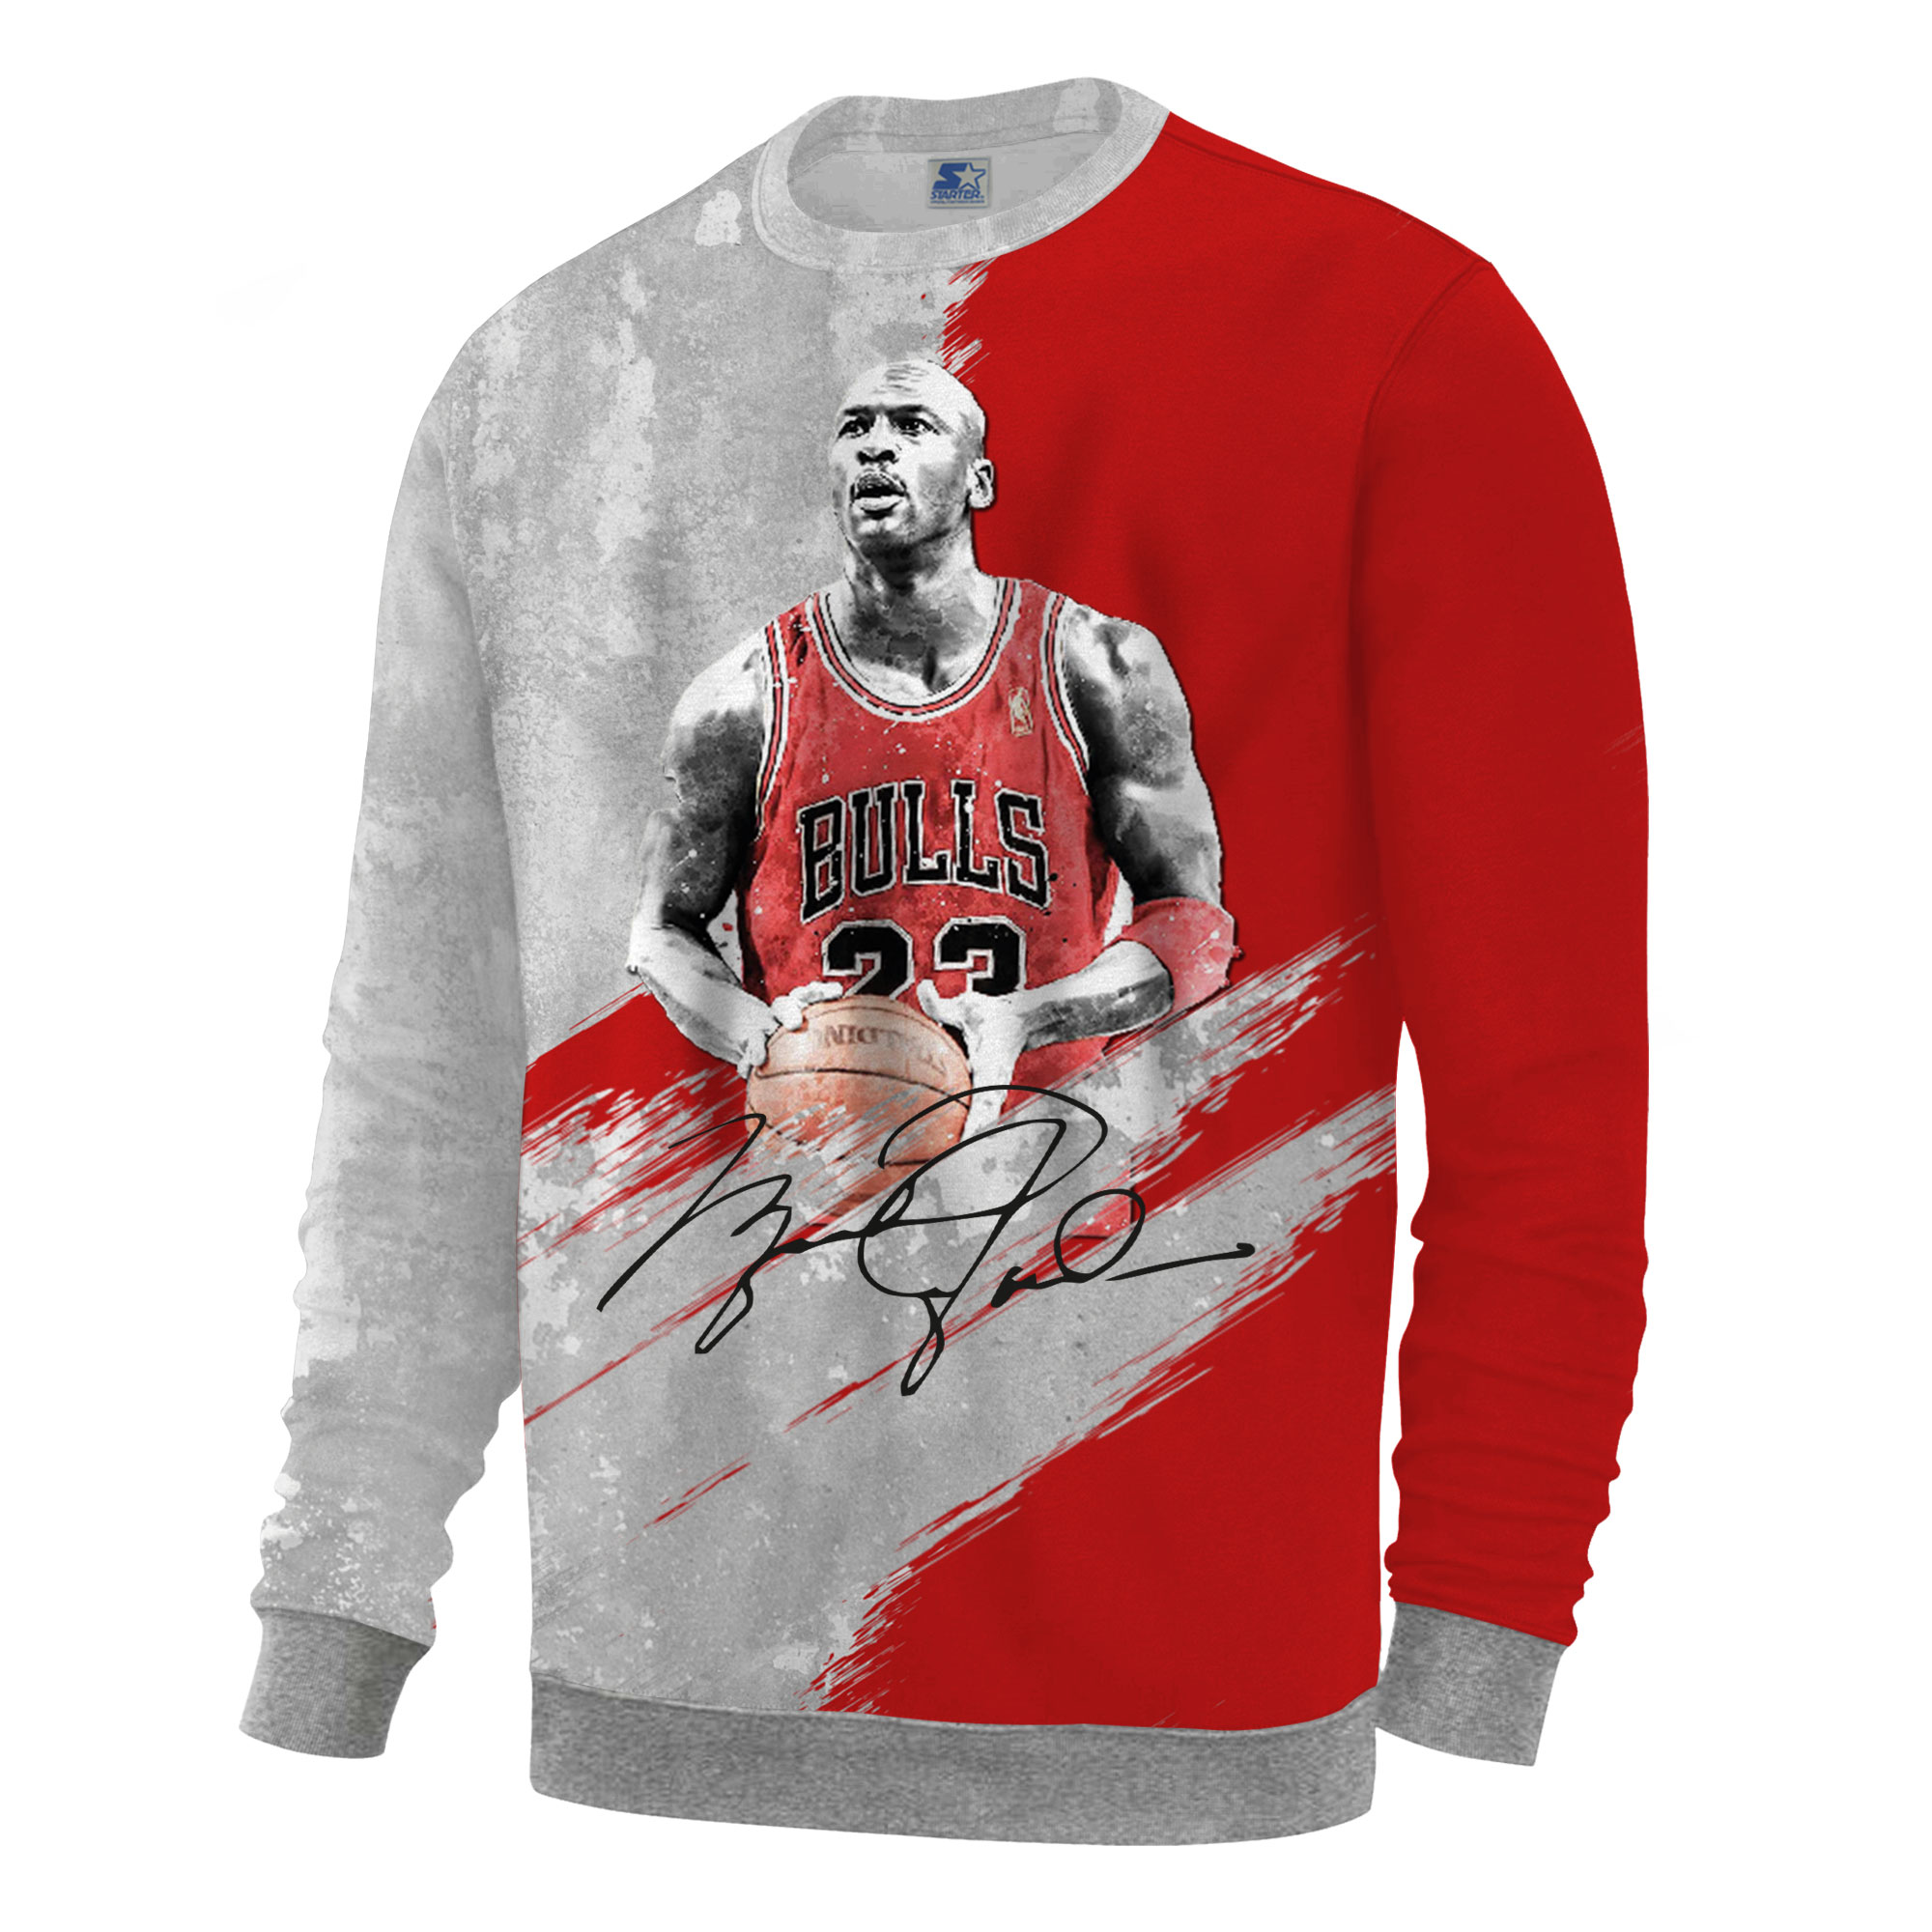 Michael Jordan 3D Basic (BSC-3D-1009)